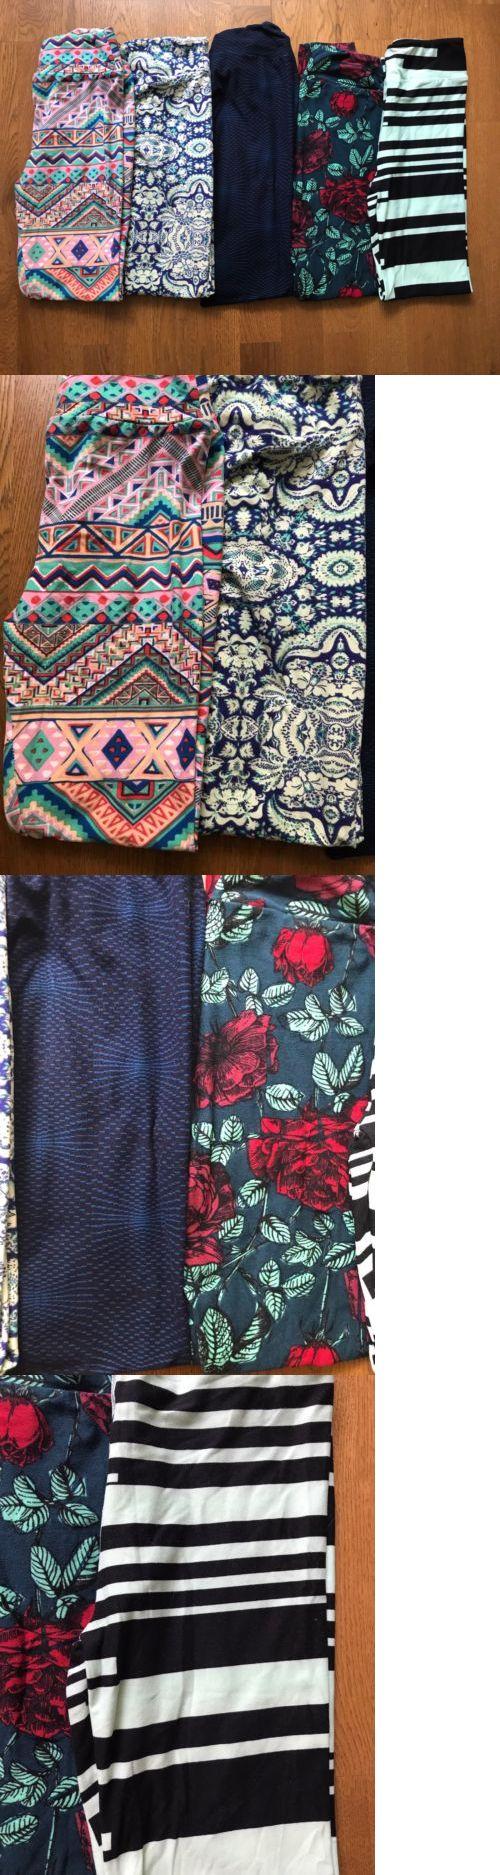 Leggings 152719: Tween Lularoe Leggings - Lot Of 5 -> BUY IT NOW ONLY: $80 on eBay!